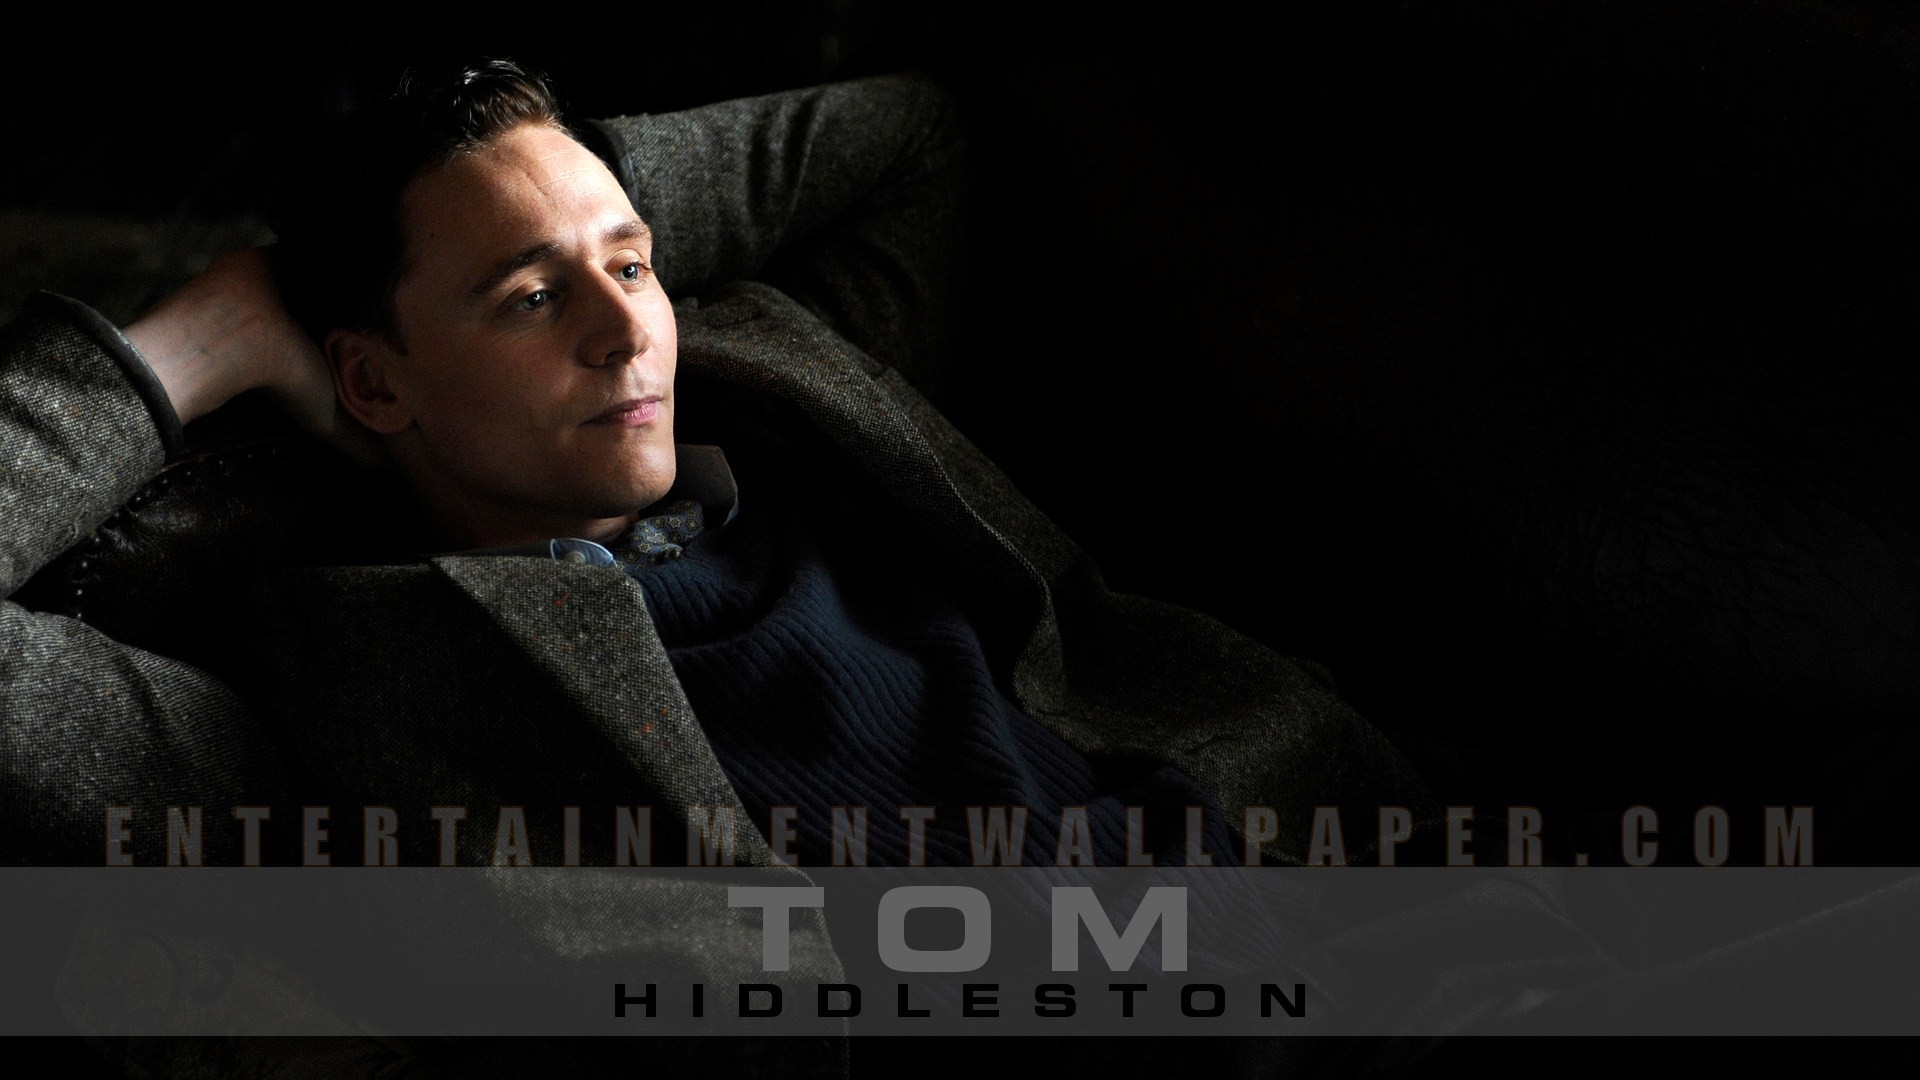 Tom Hiddleston Wallpaper – Original size, download now.